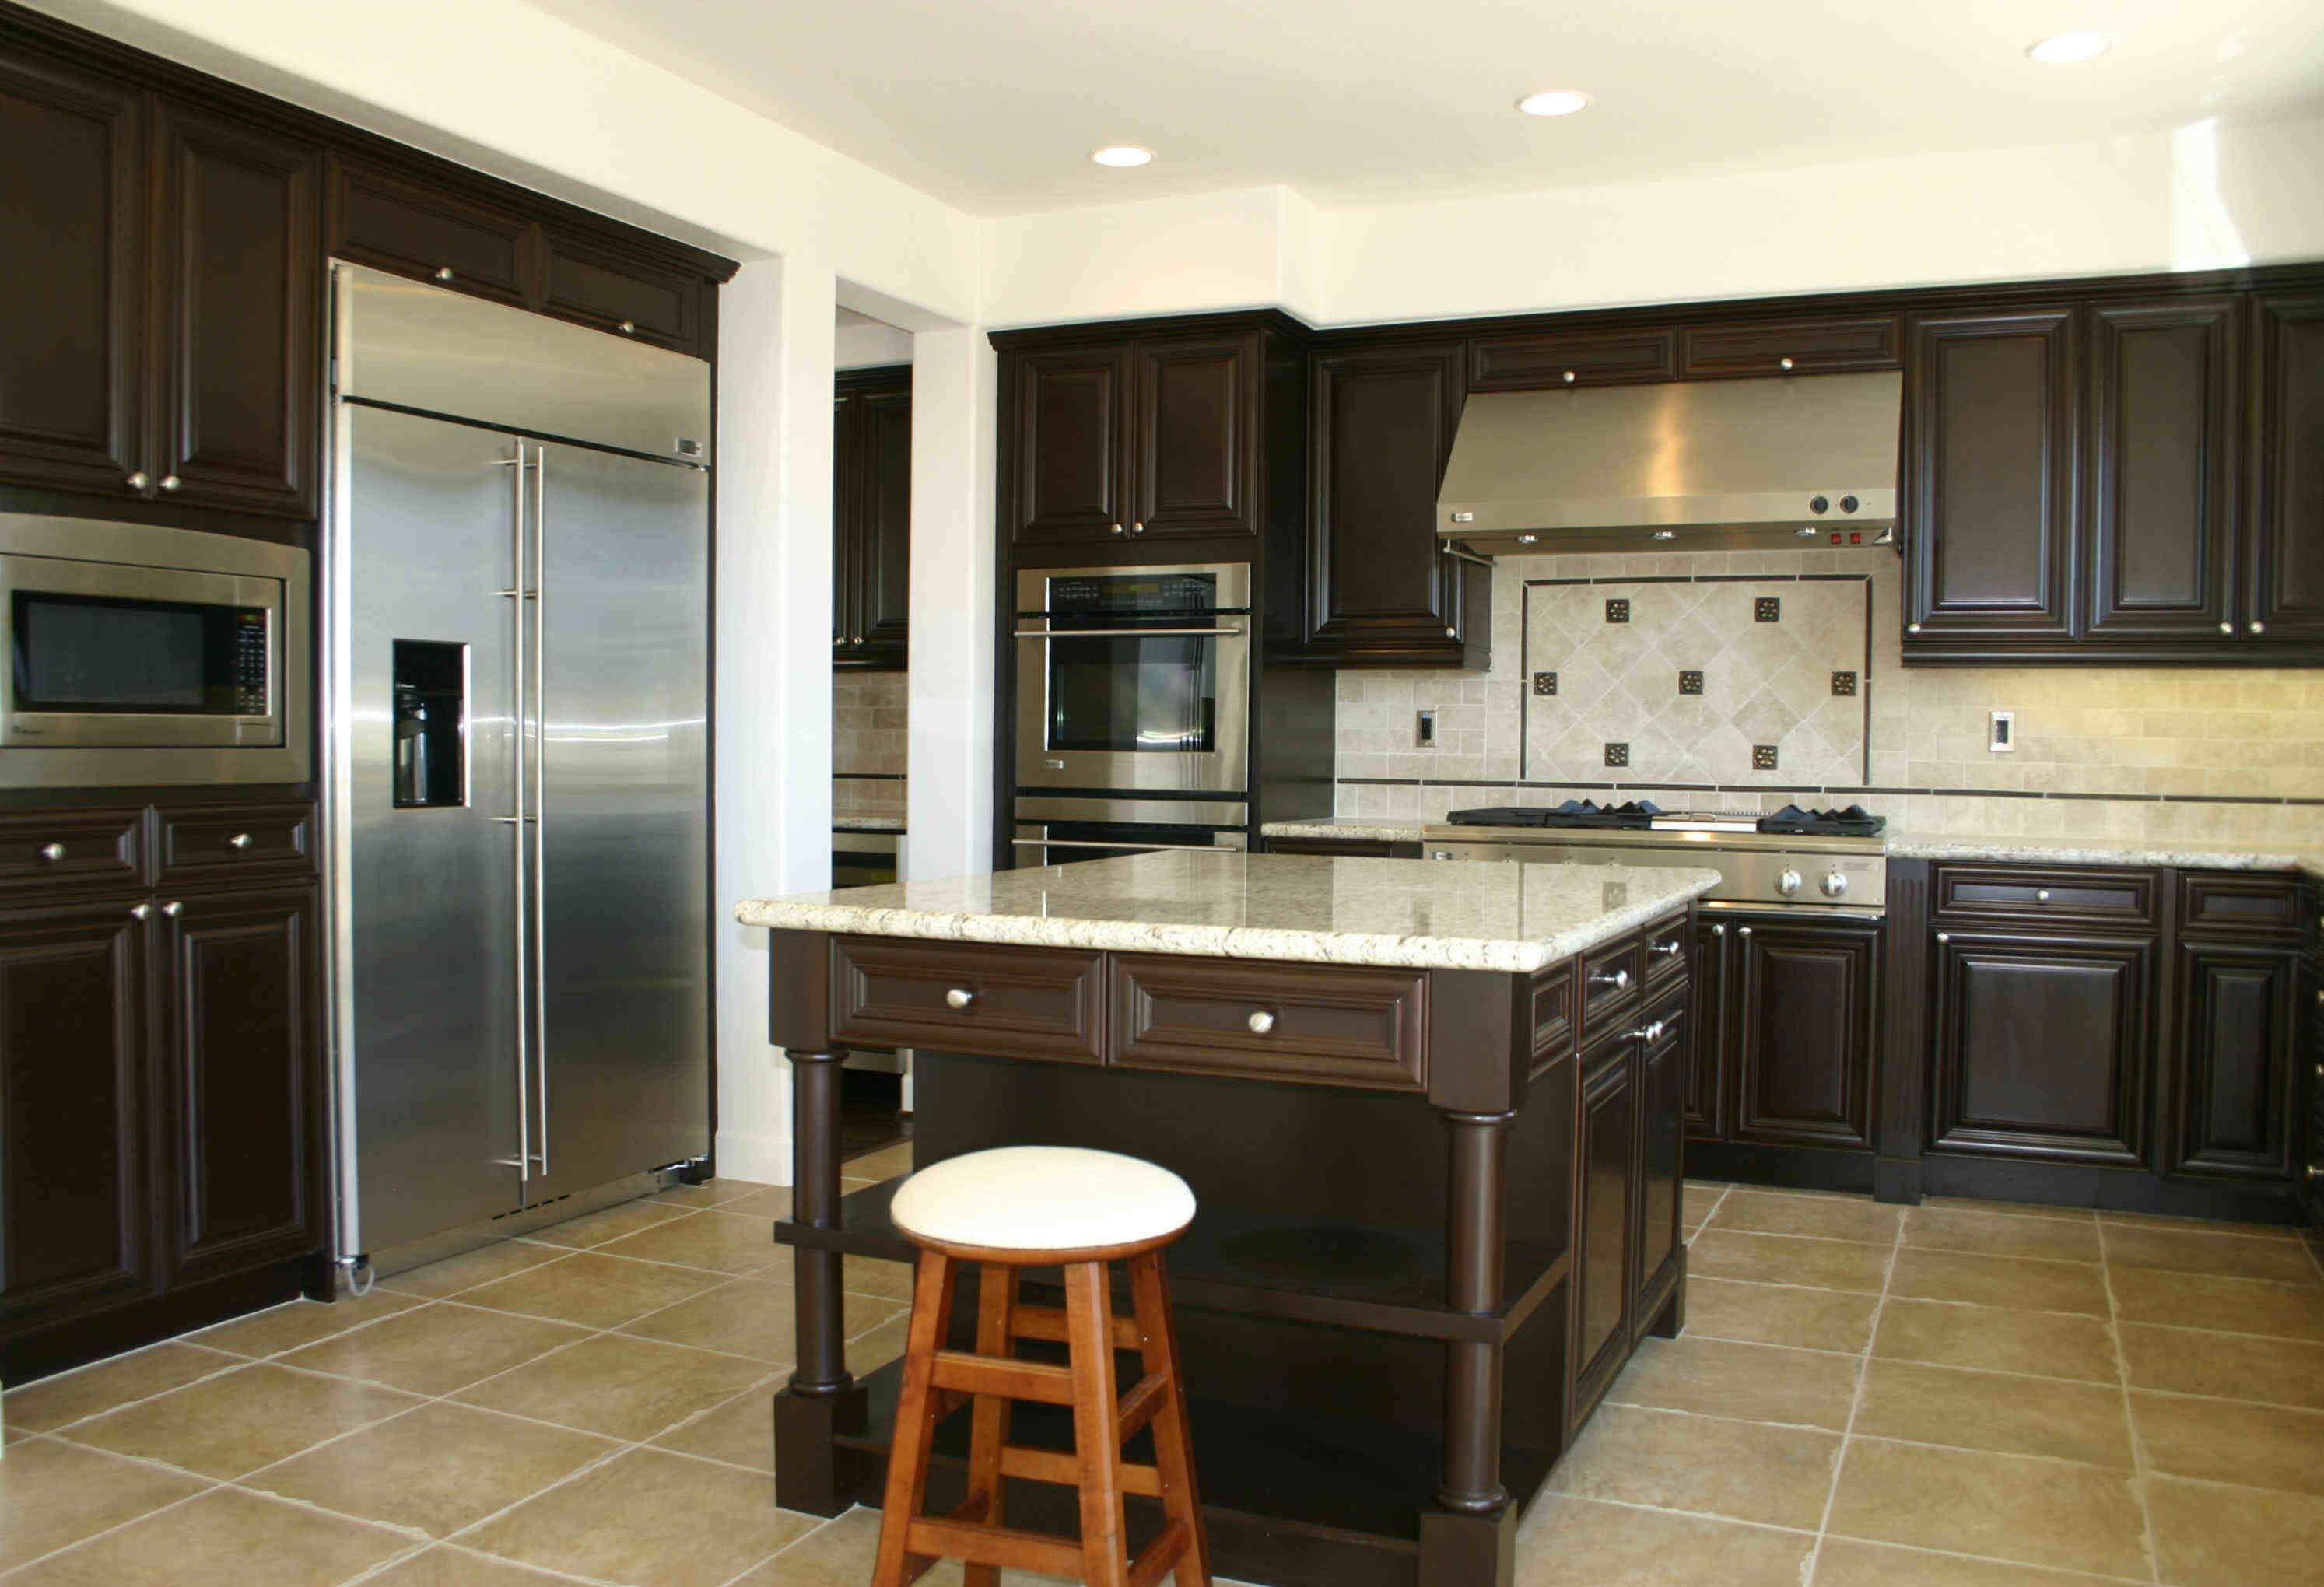 kitchen renovation | Home Decor and Design Ideas | Pinterest